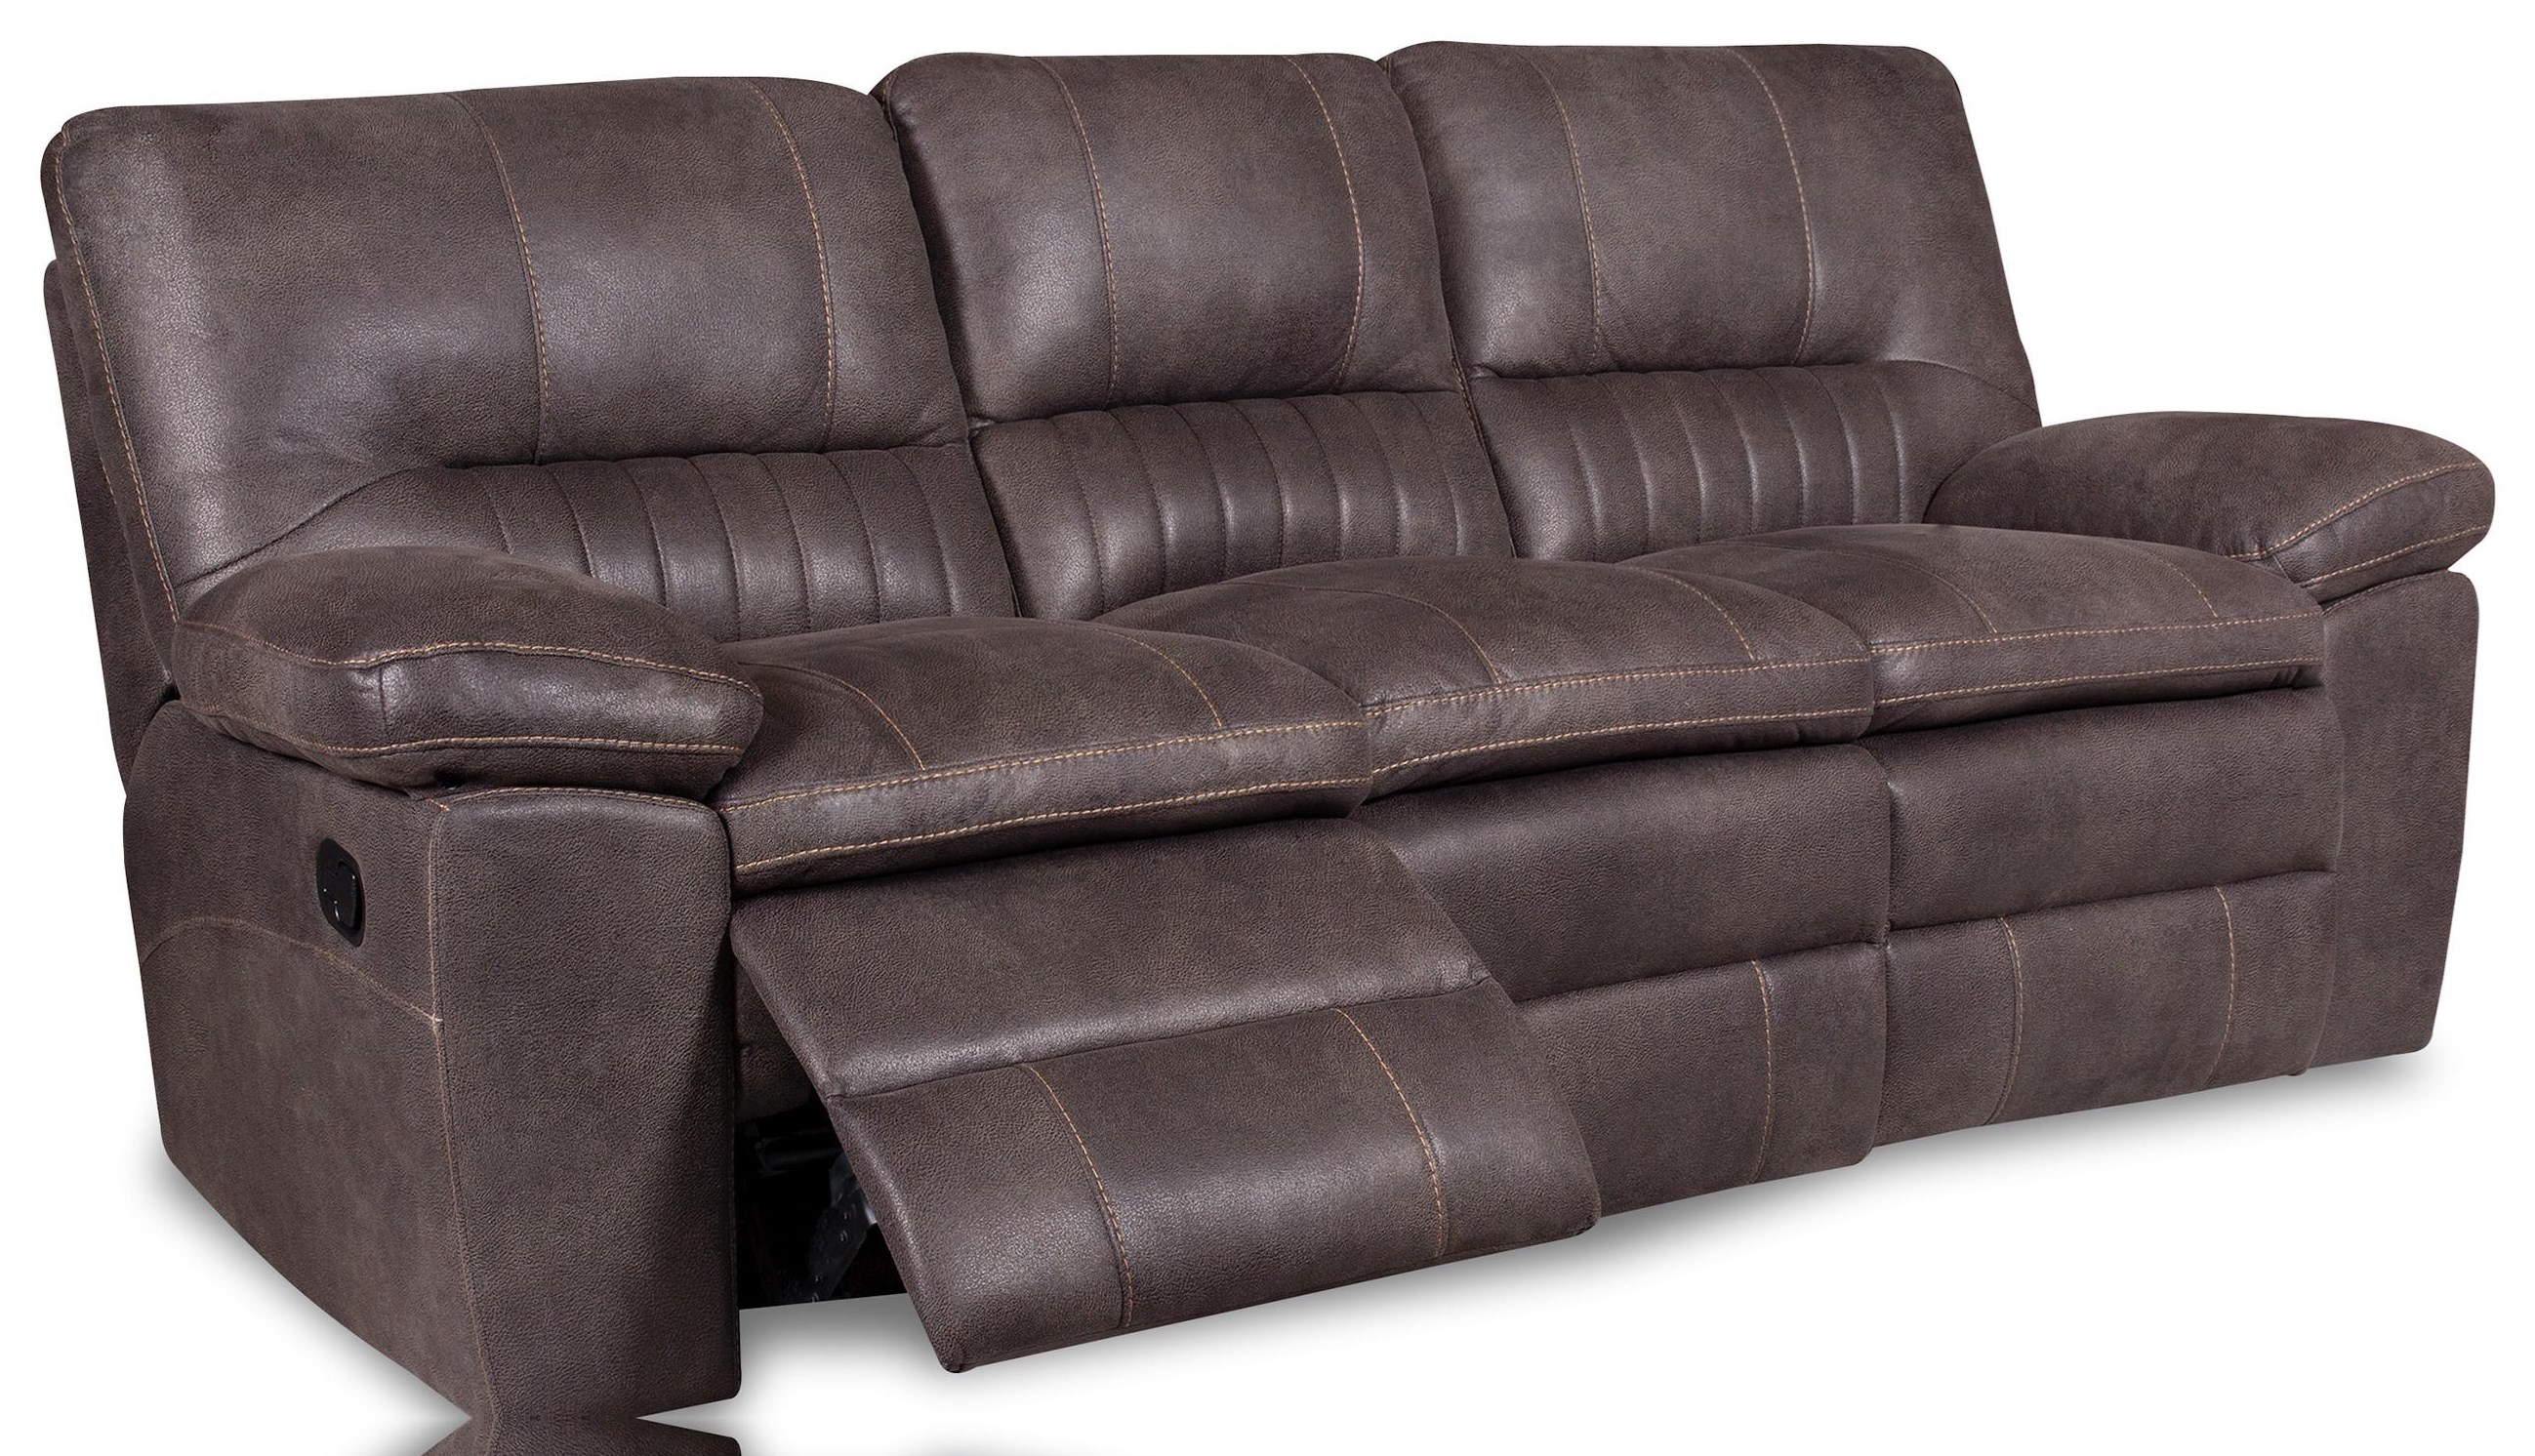 Amherst Reclining Sofa at Virginia Furniture Market